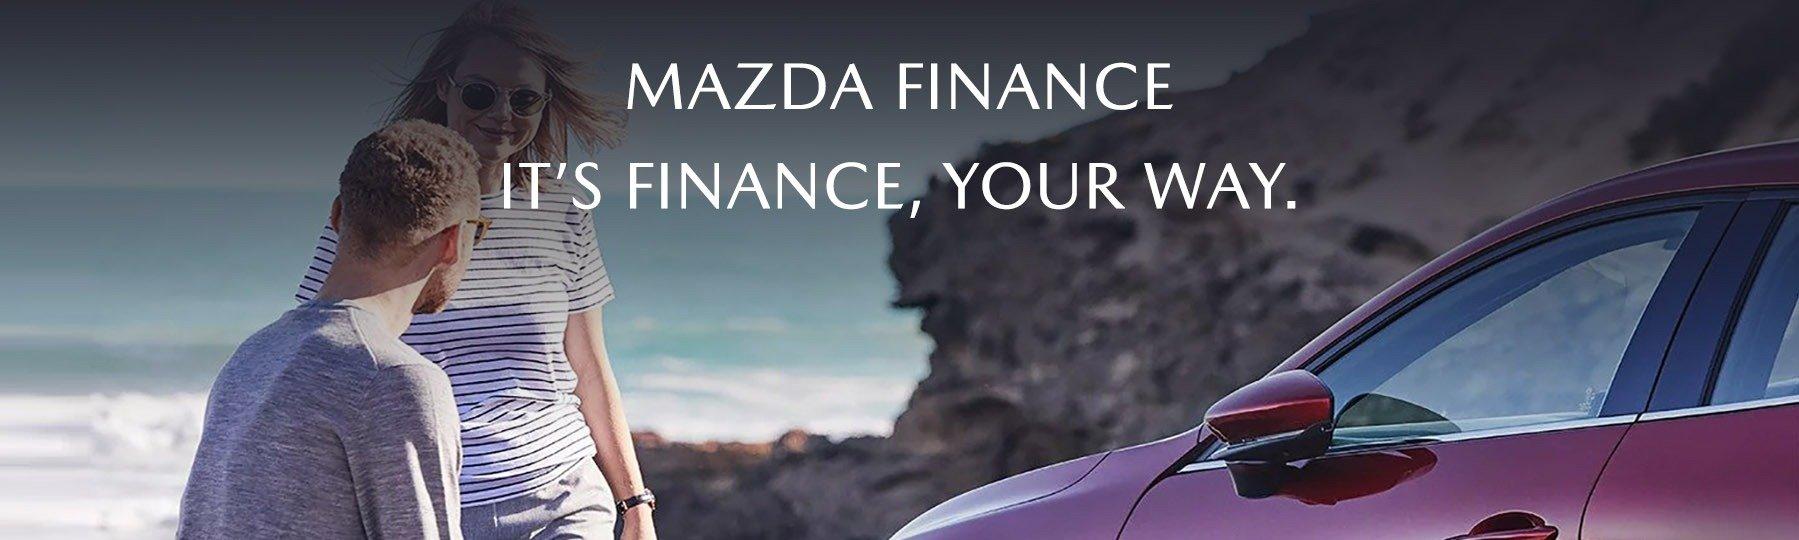 Mazda Finance